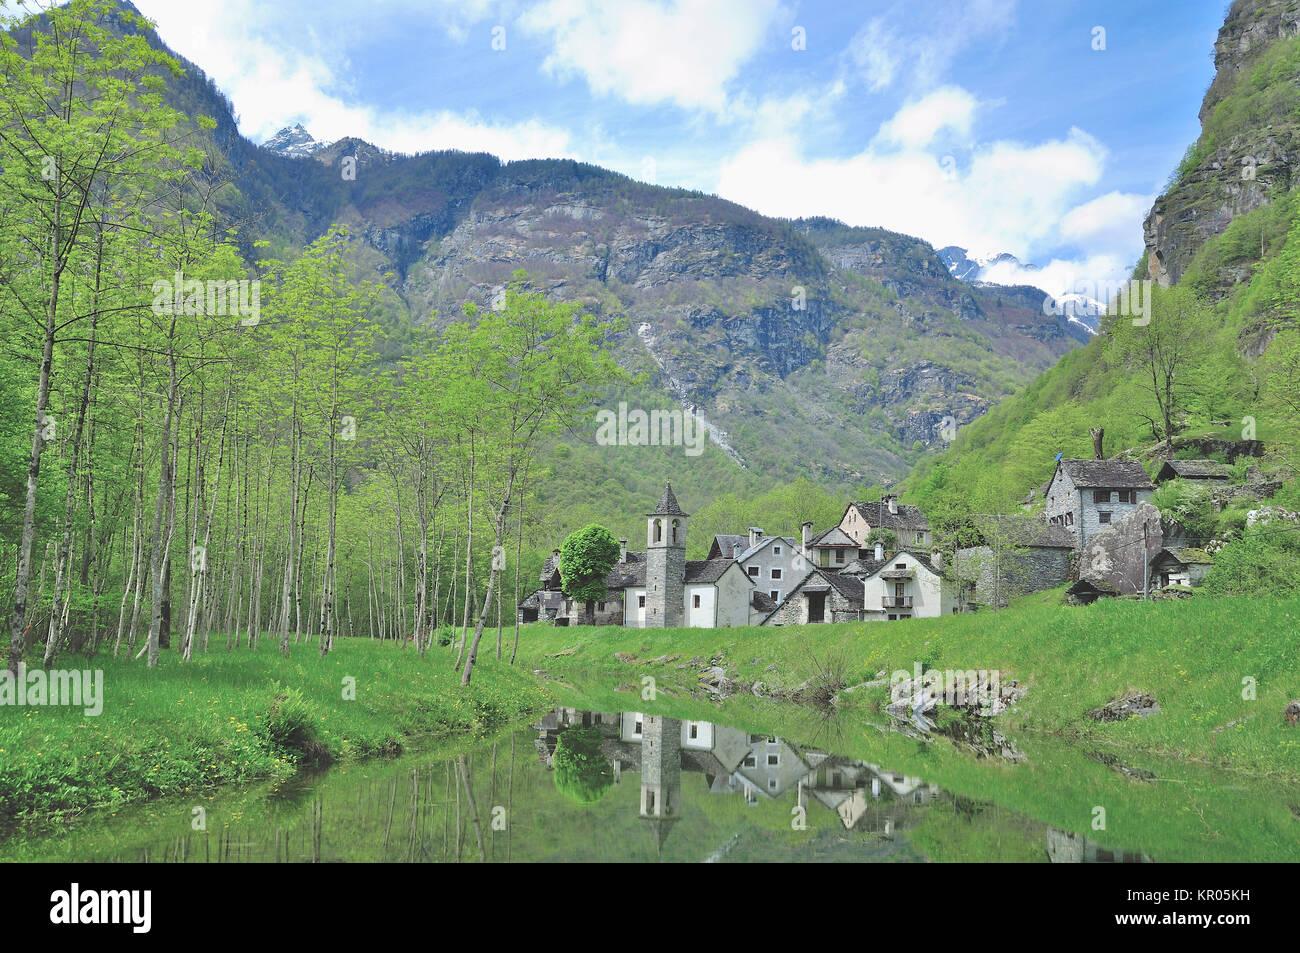 the hamlet ritorto in val bavona in ticino,switzerland - Stock Image